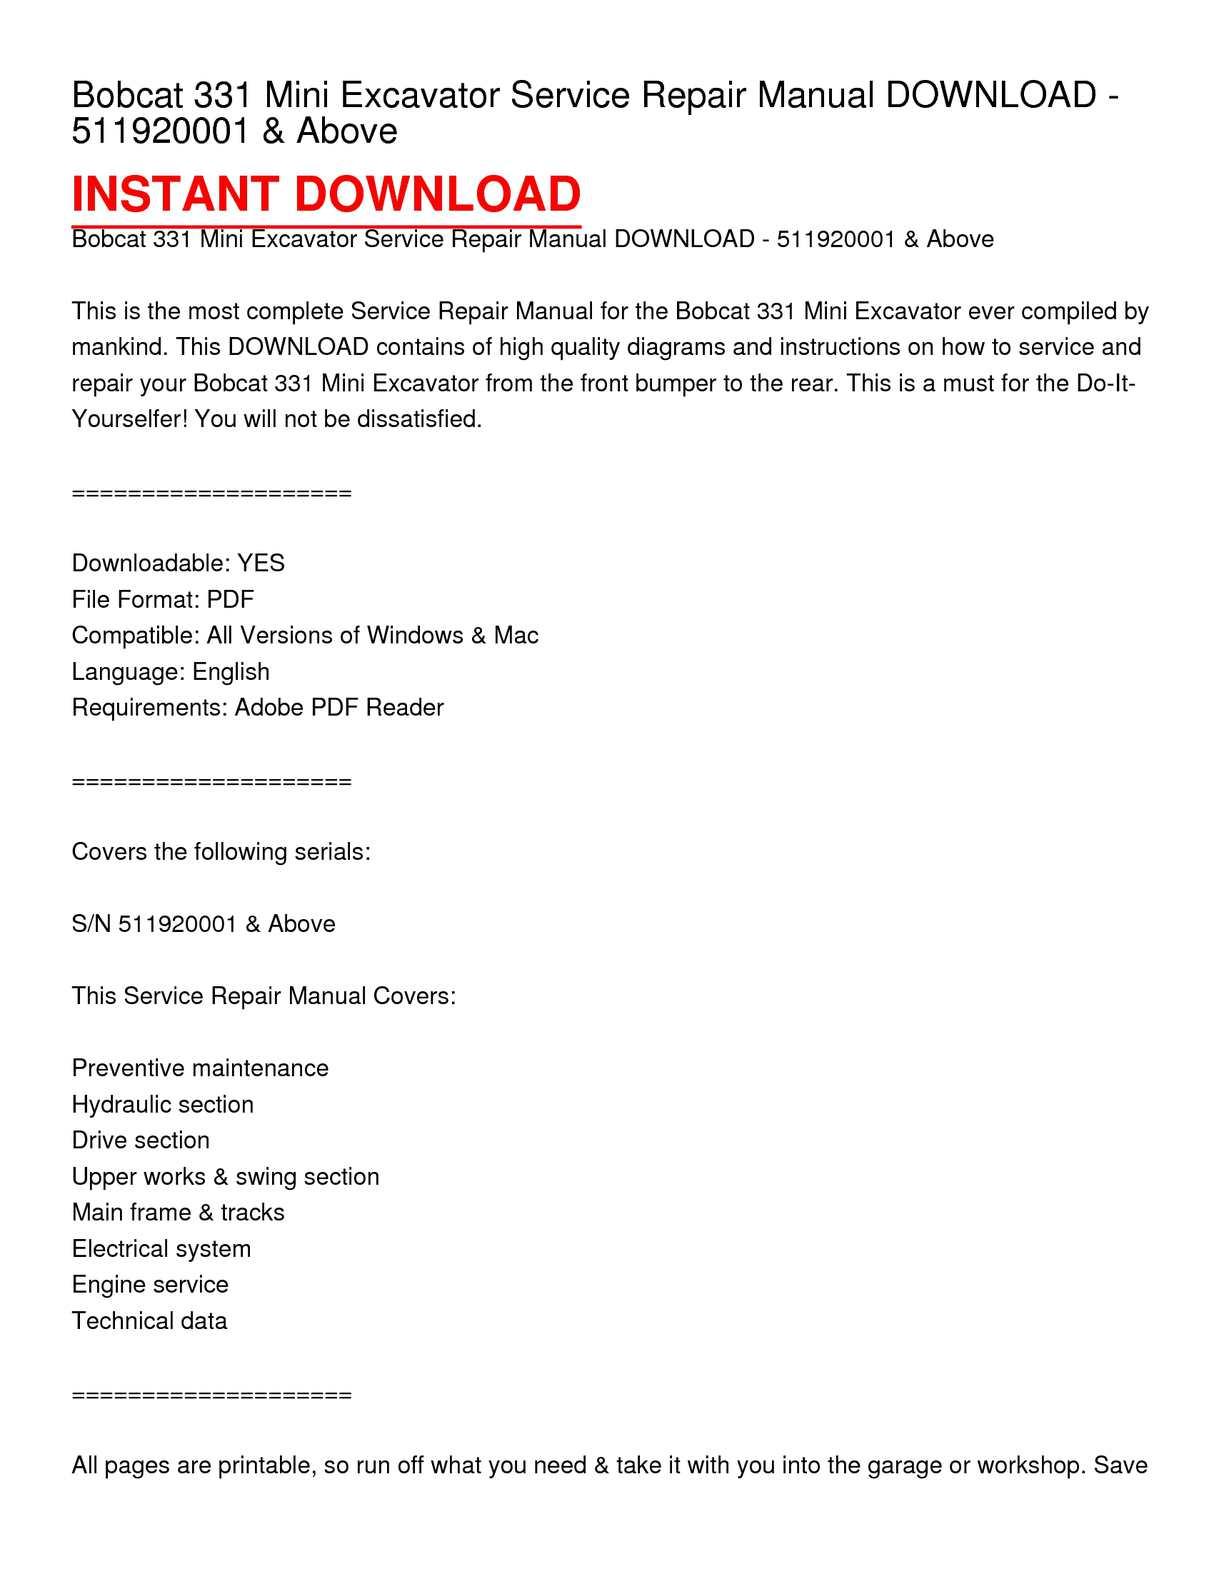 Calaméo - Bobcat 331 Mini Excavator Service Repair Manual DOWNLOAD -  511920001 & Above